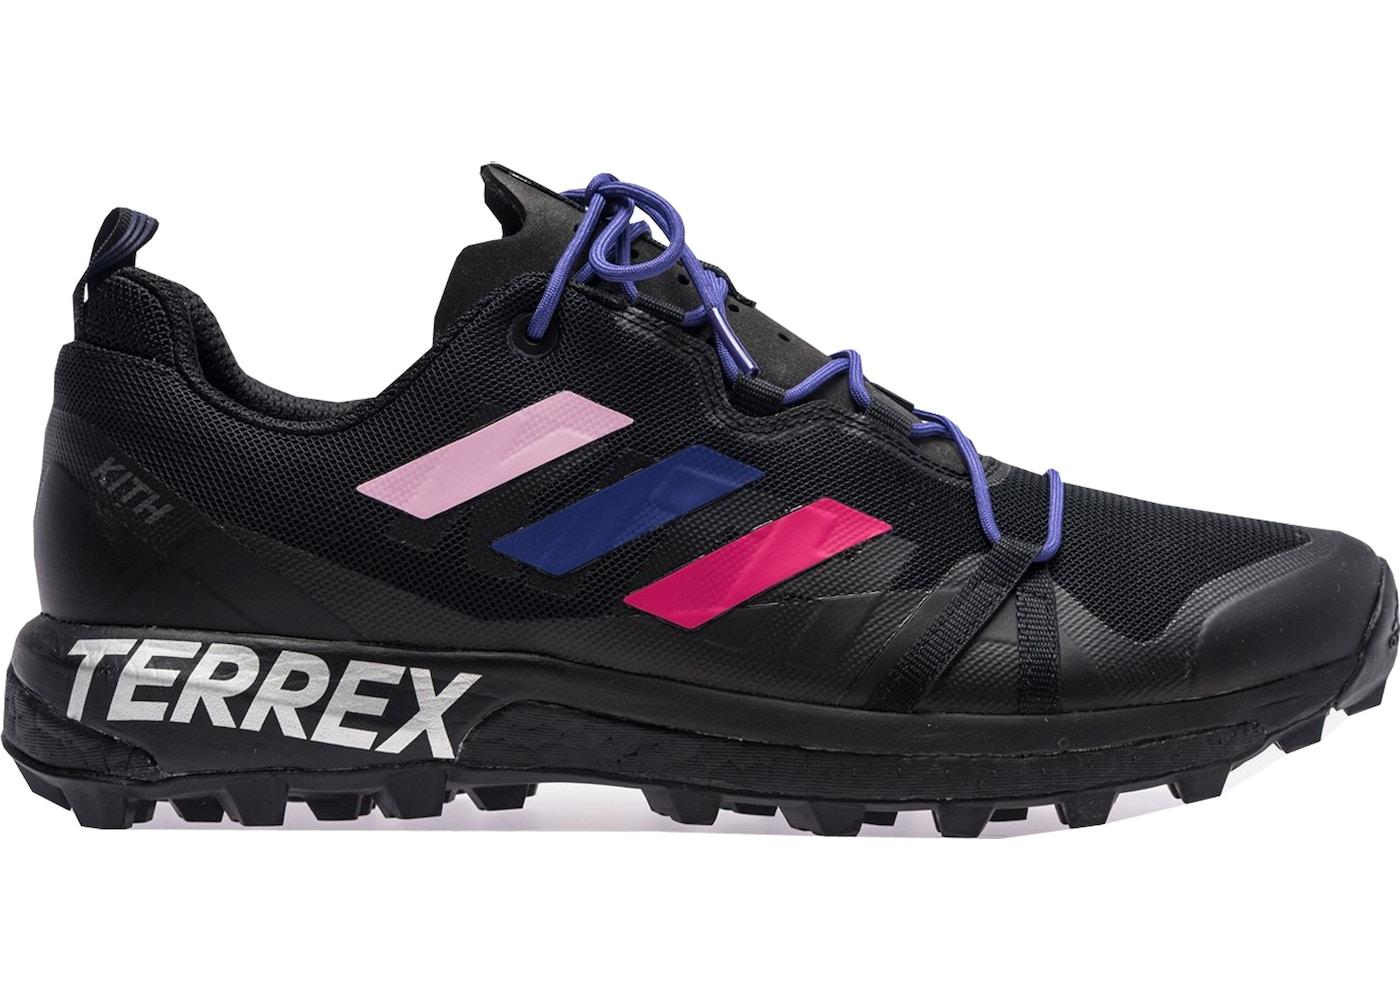 separation shoes 9f07b c0d40 adidas Terrex Skychaser Kith Black